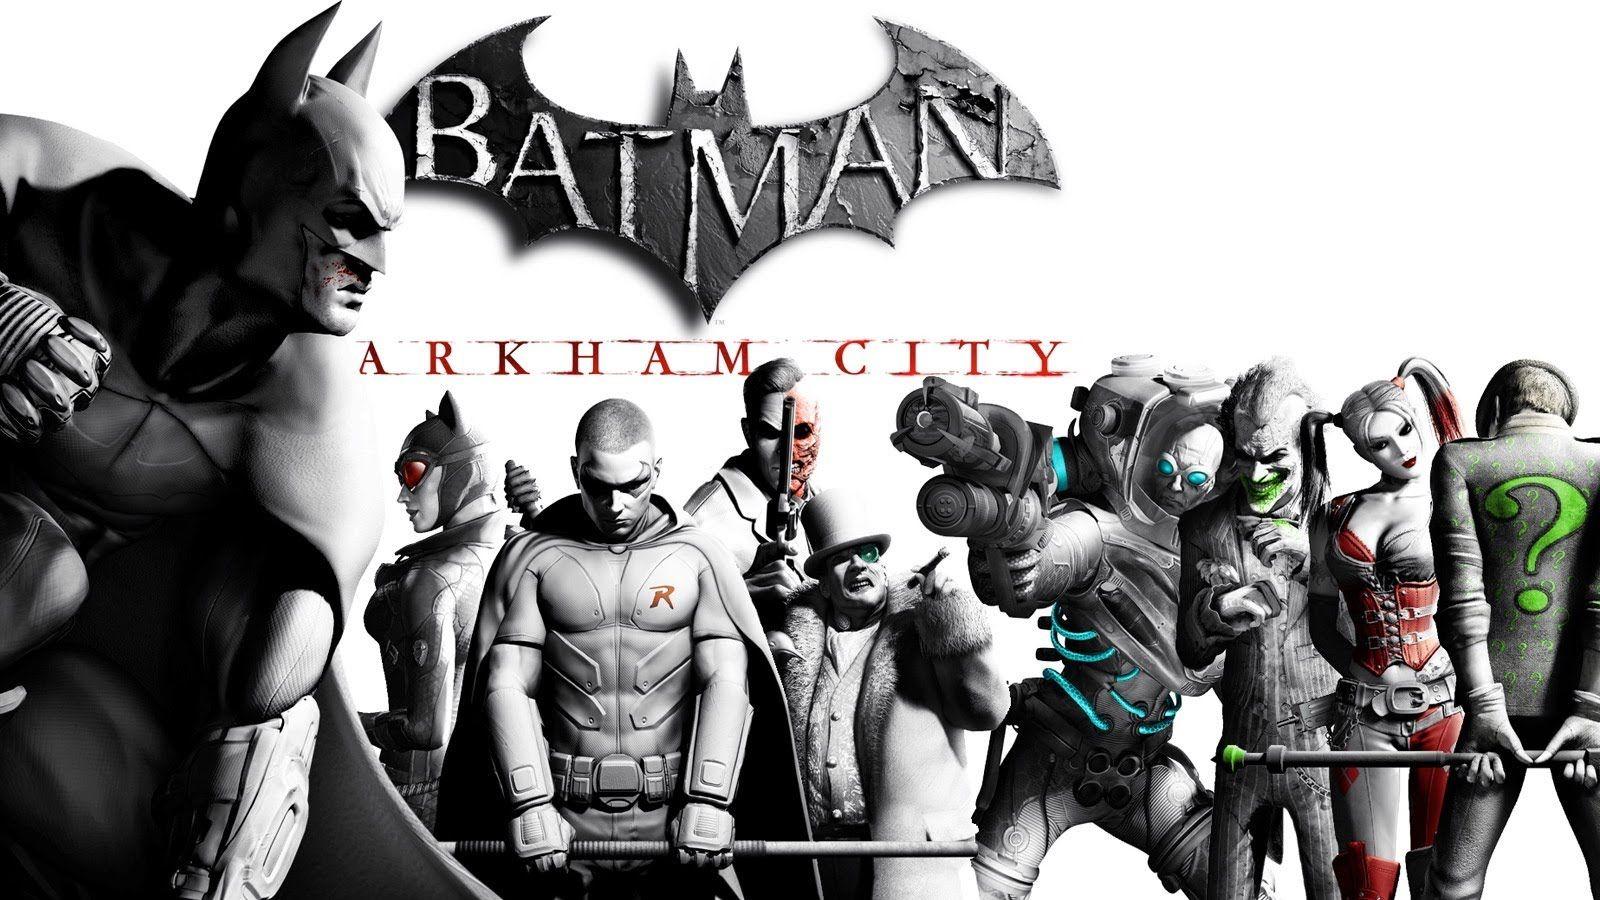 Batman: Arkham City [Game Movie] | good luving | Pinterest ...